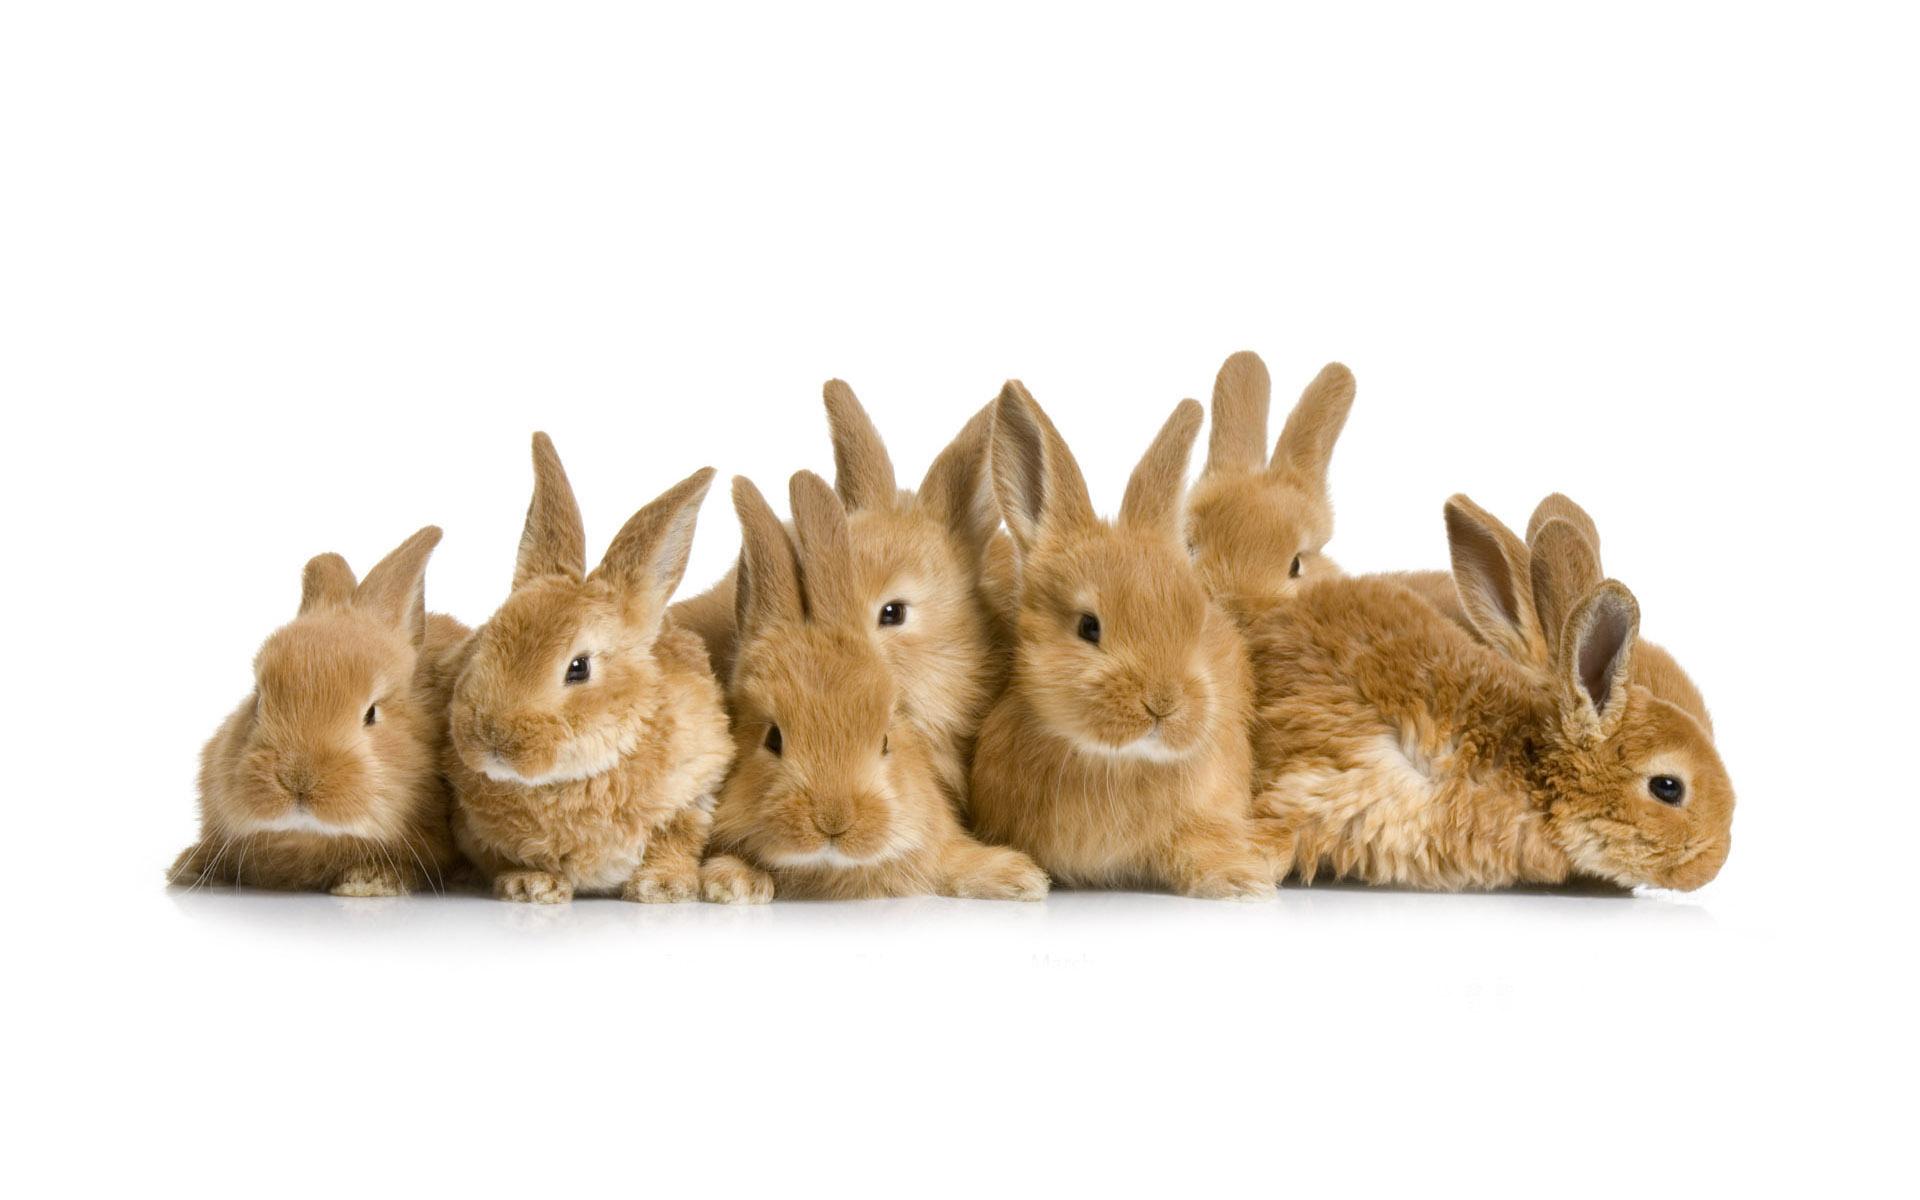 lot of rabbits